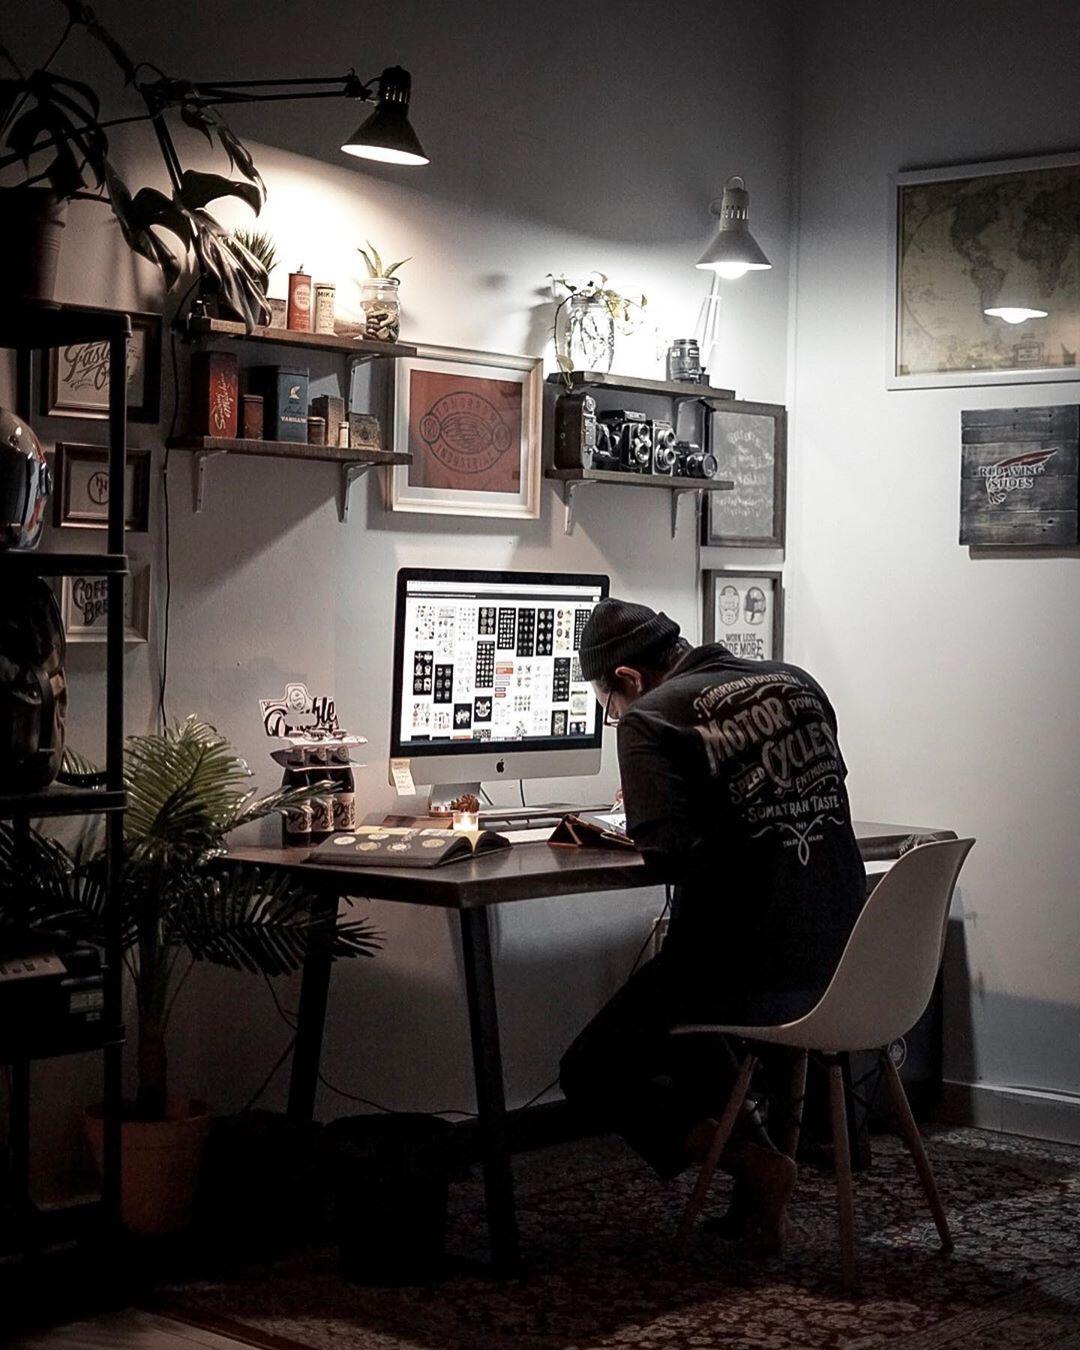 Khairul Fikri On Instagram Midnight Vibes Khairulitiesproject Workspace Homestudio Work Space Decor Photography Home Office Design Studio Workspace